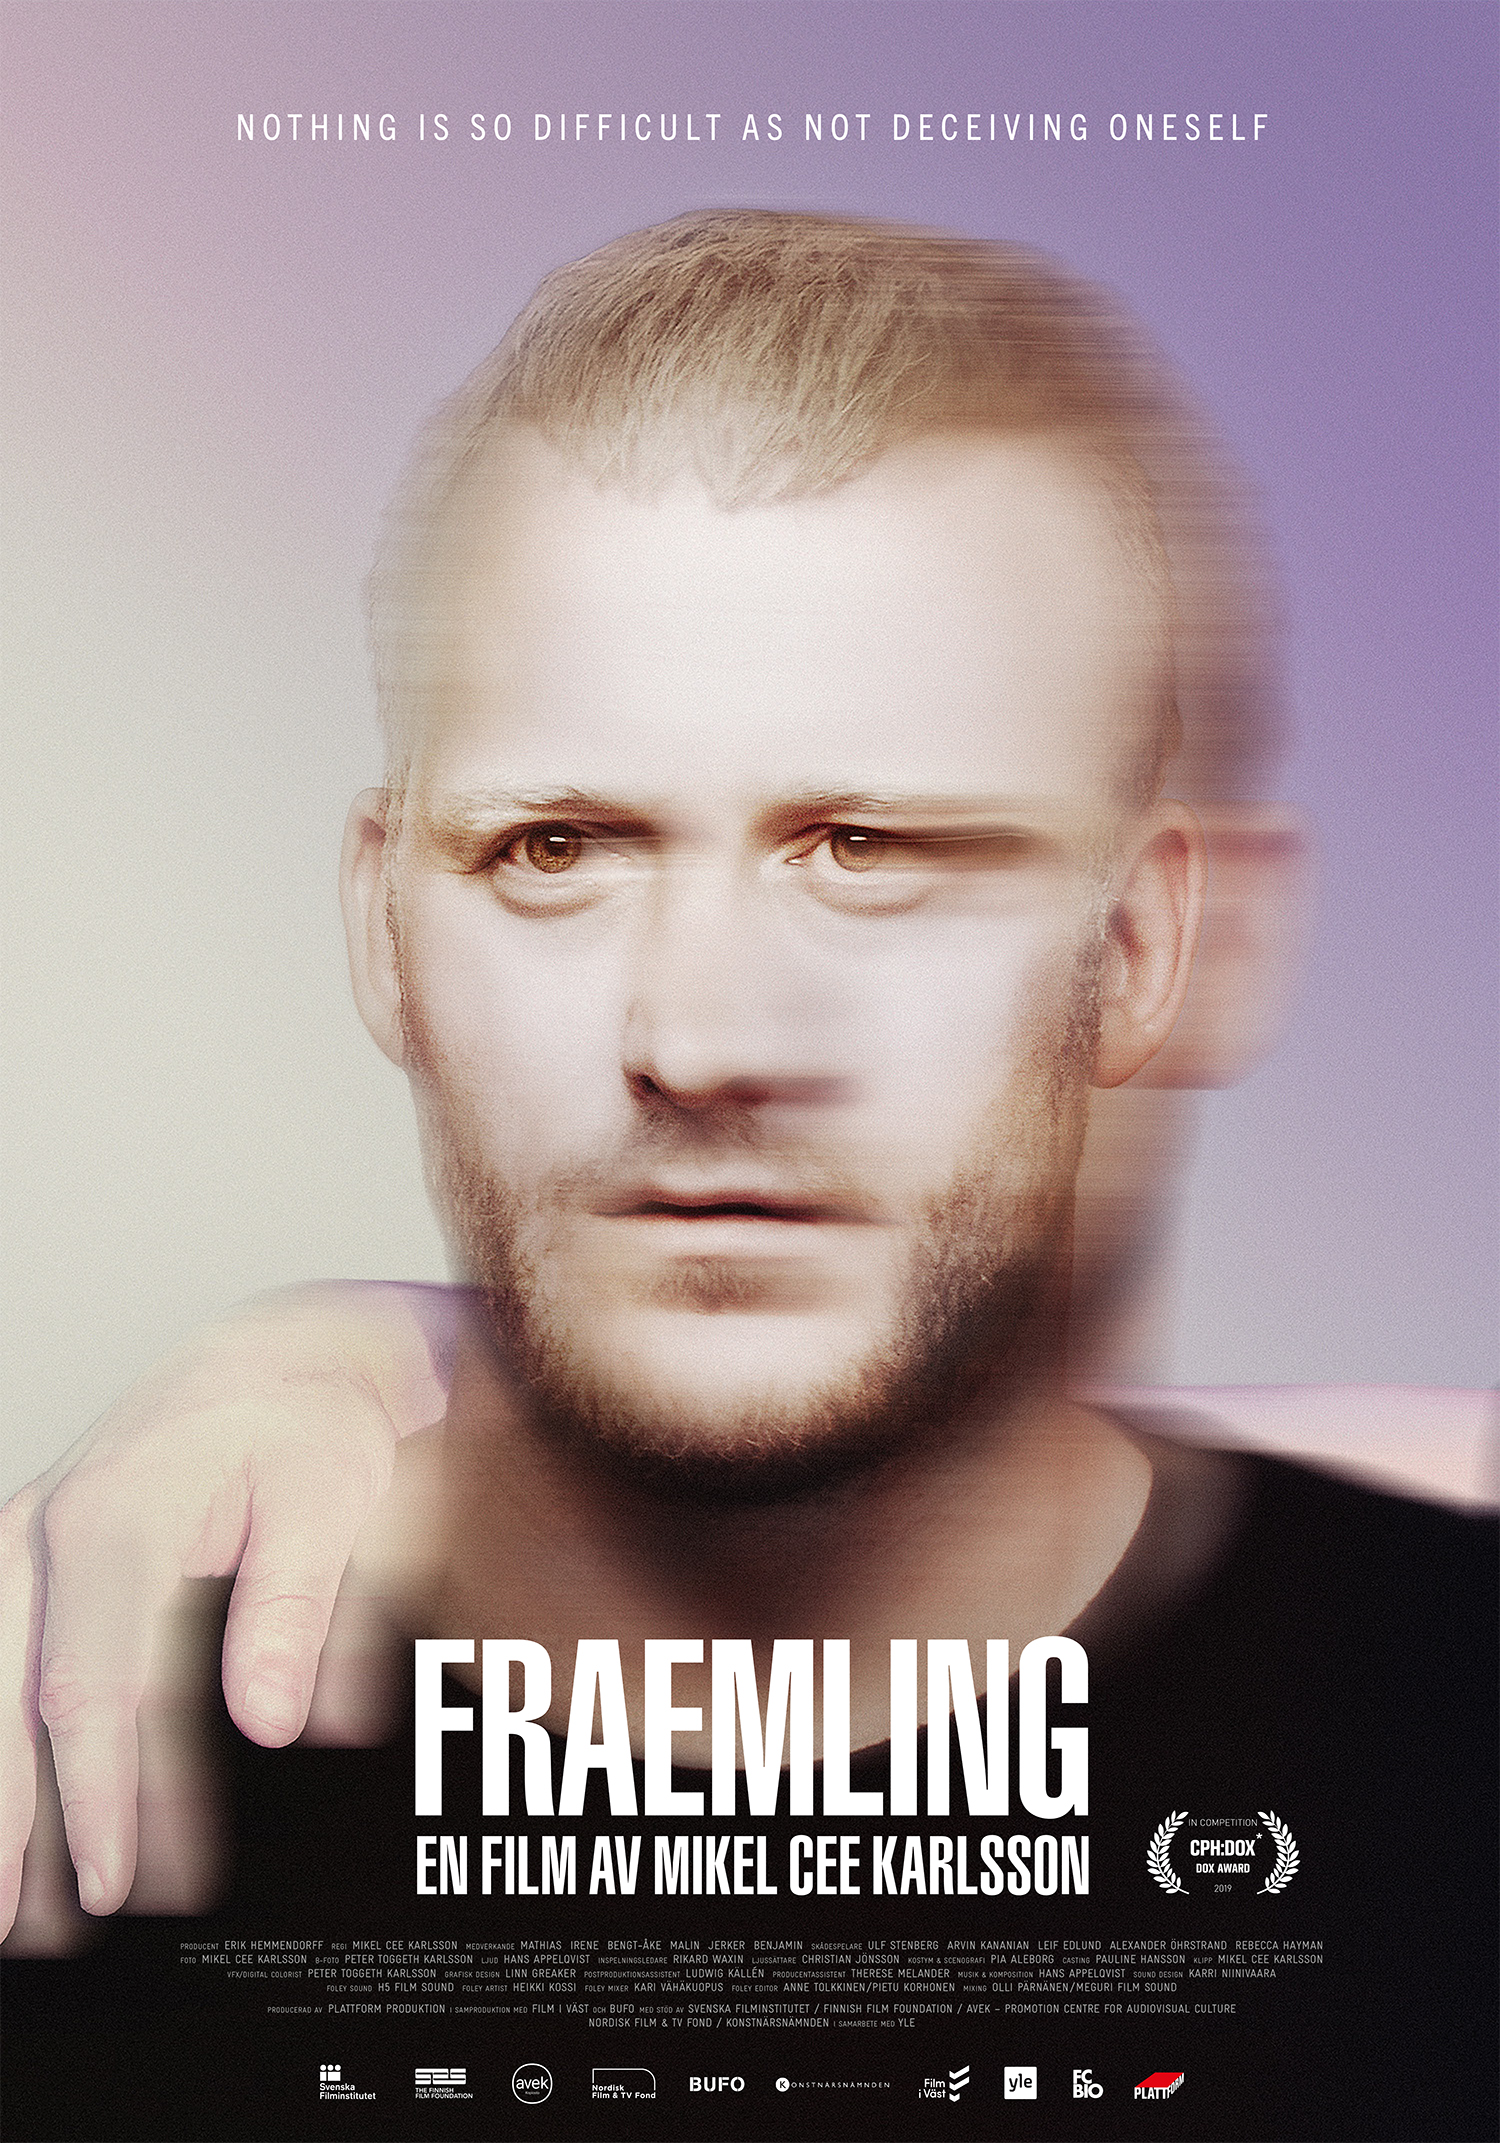 FRAEMLING (A Stranger)